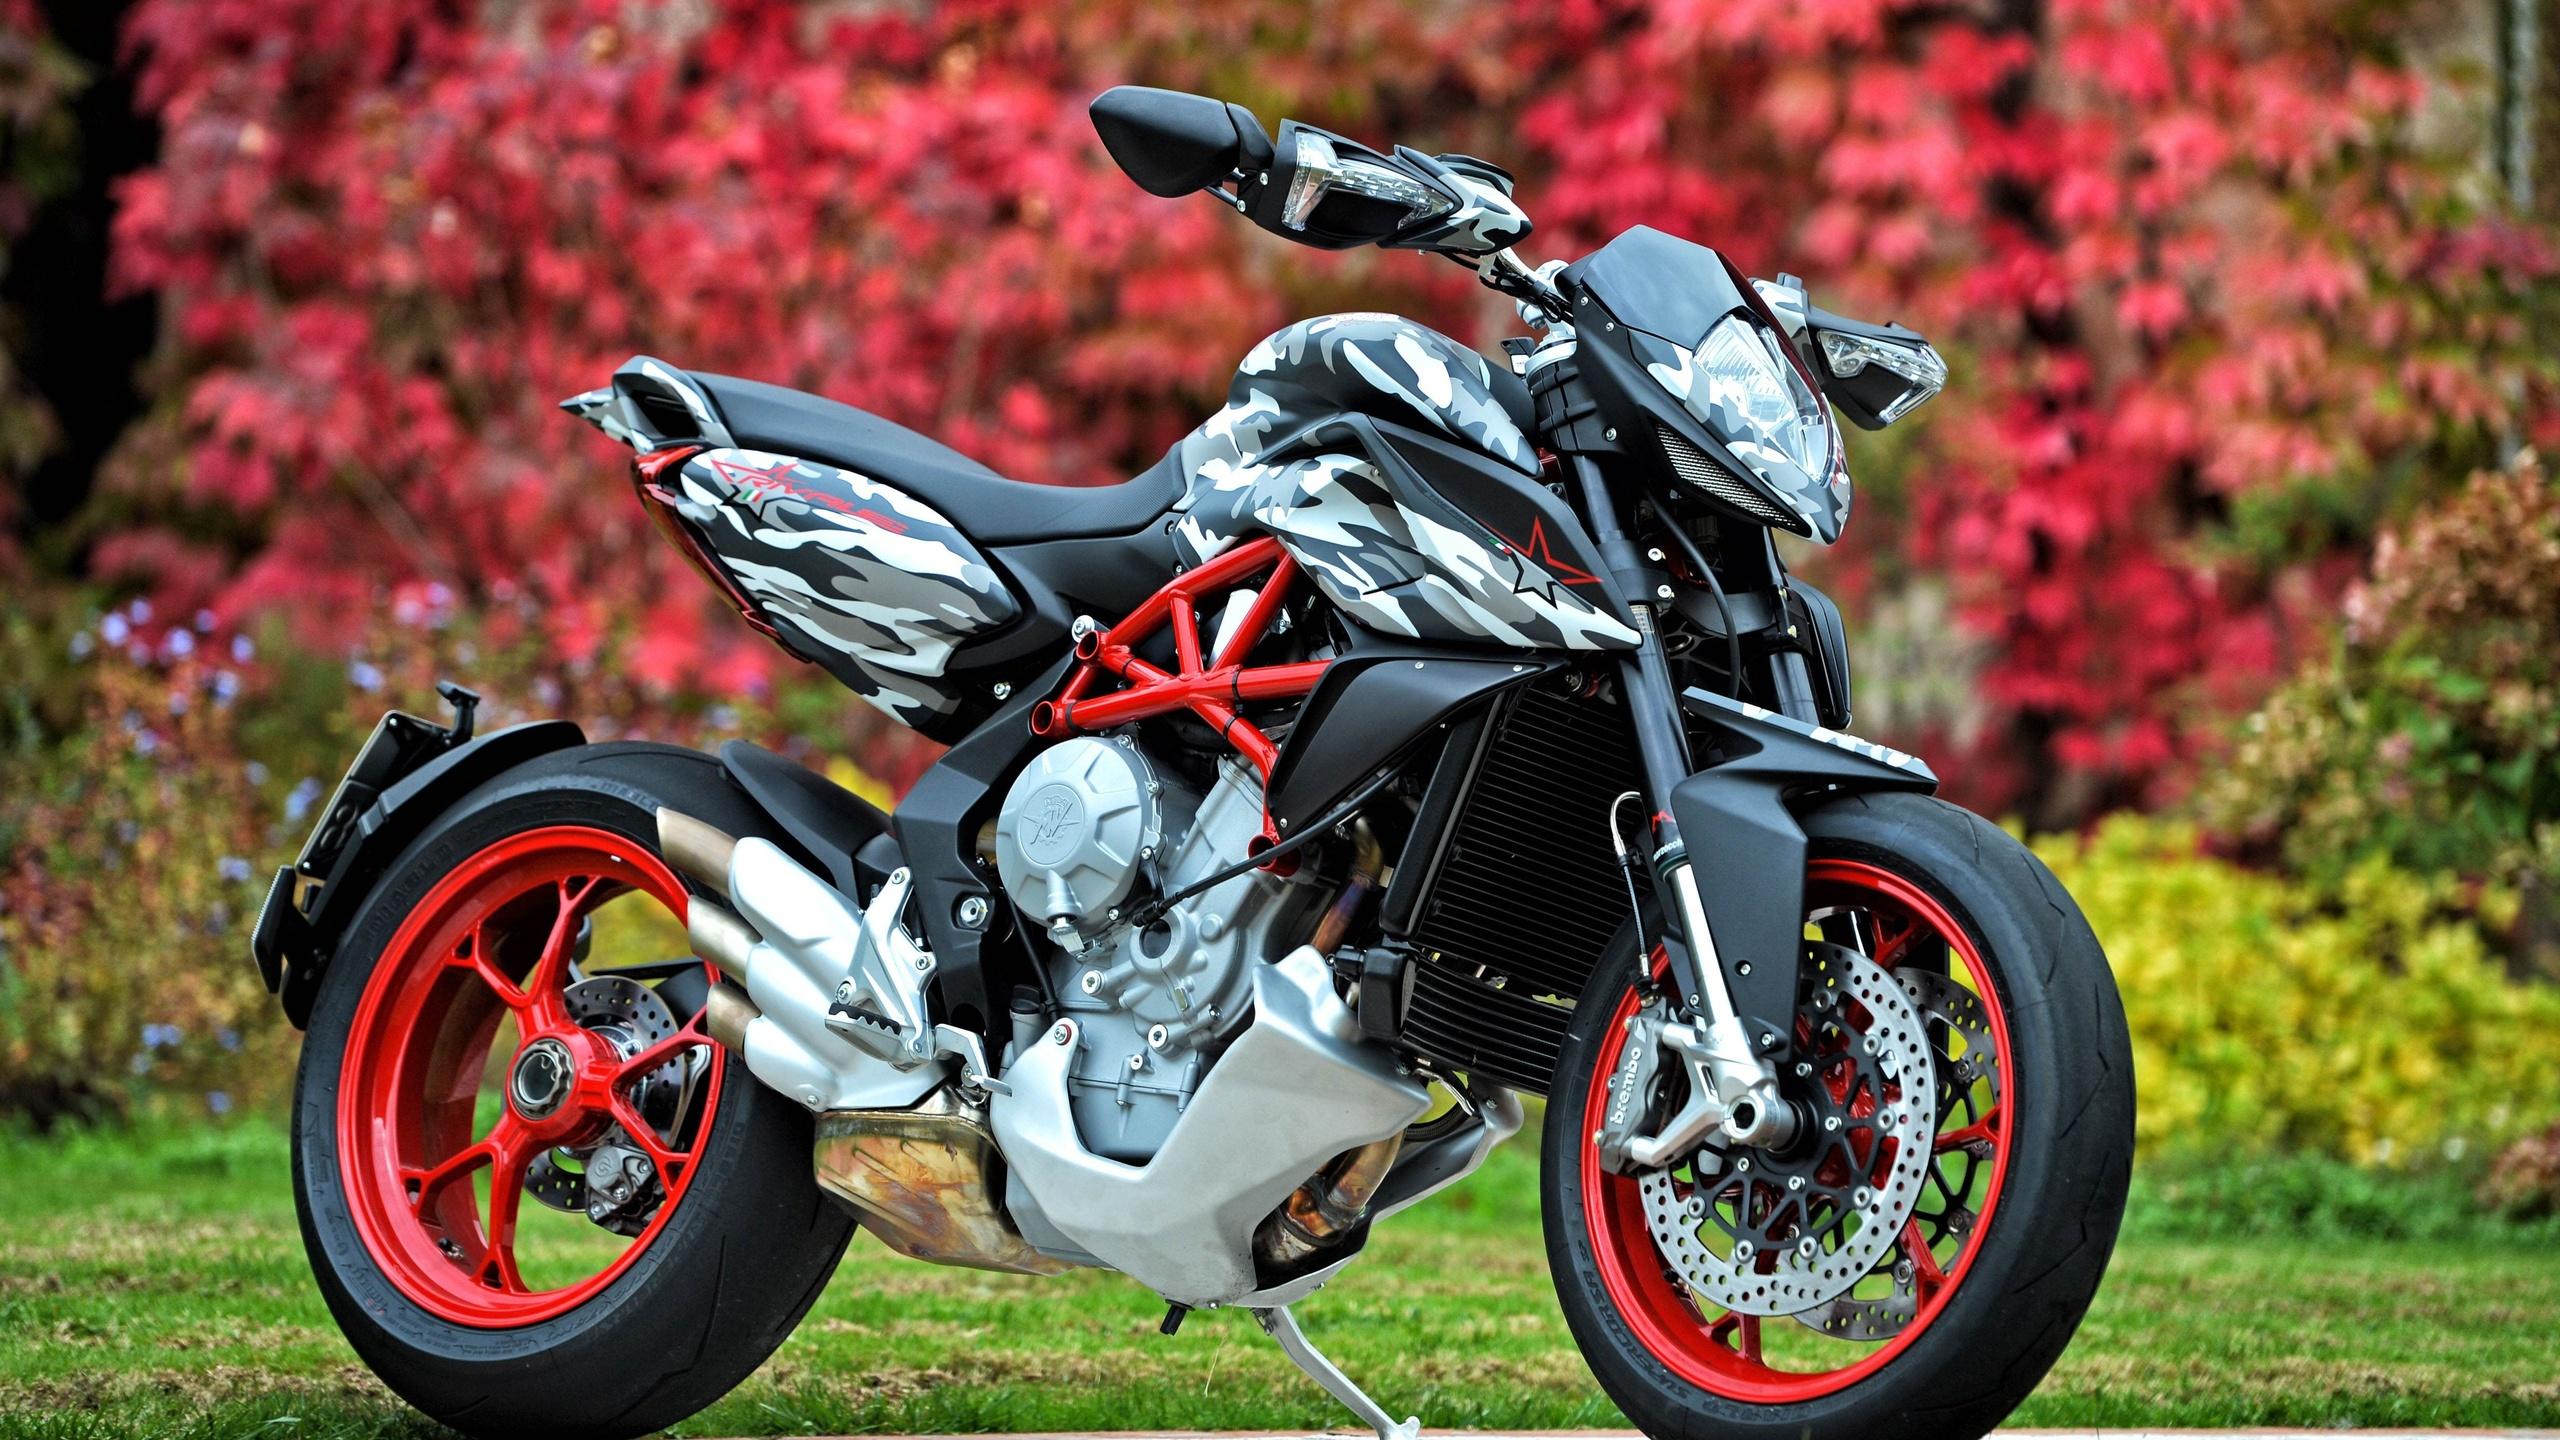 Мотоцикл фотки крутые